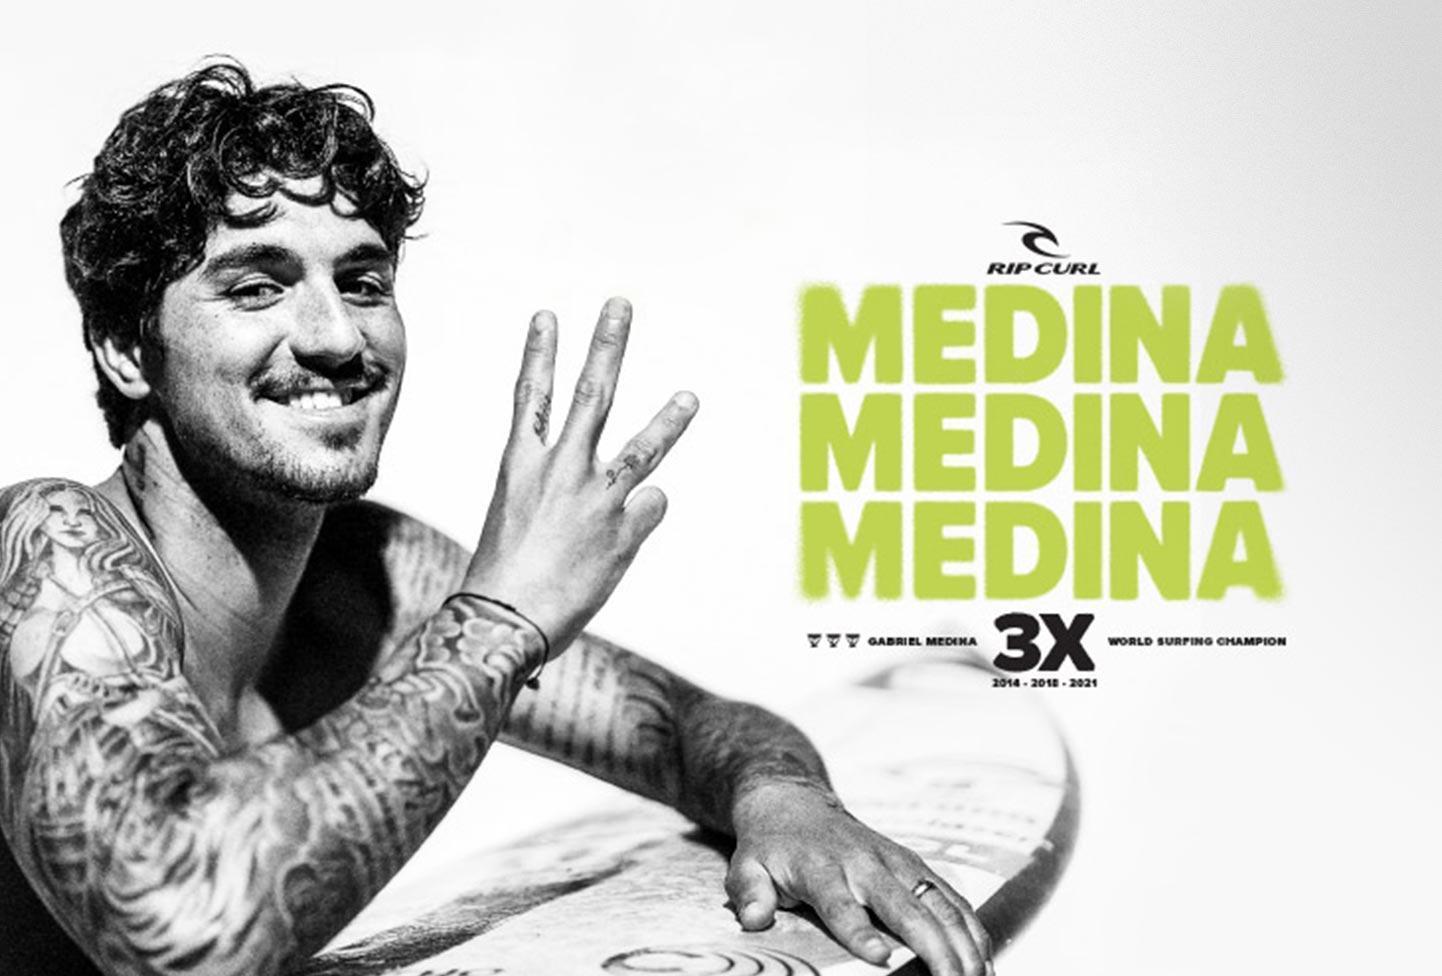 3x MEDINA World Champion Surfing Rip Curl Cabianca Surfboards